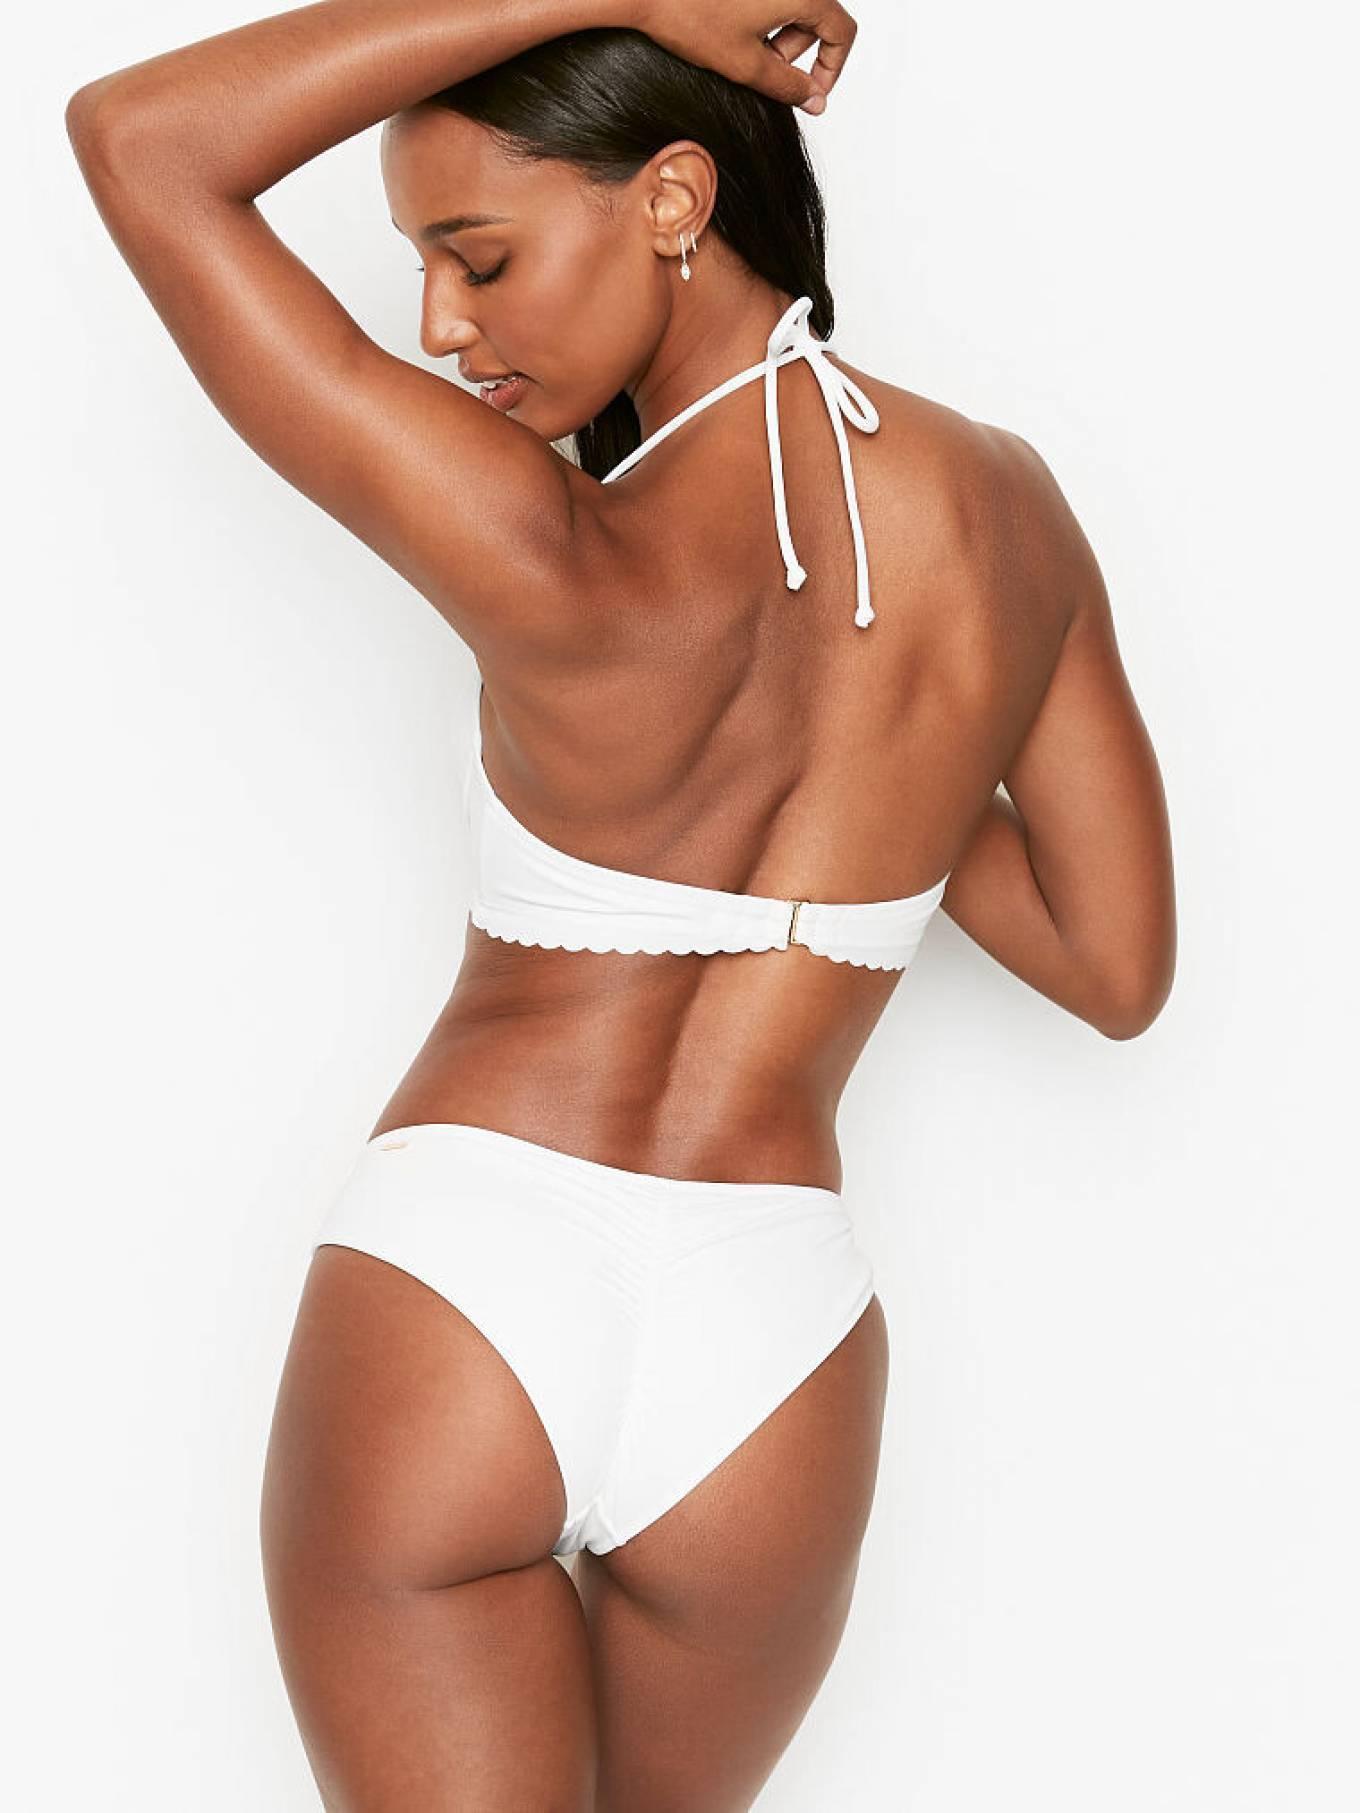 Jasmine Tookes 2020 : Jasmine Tookes – Victorias Secret collection – November 2020-12